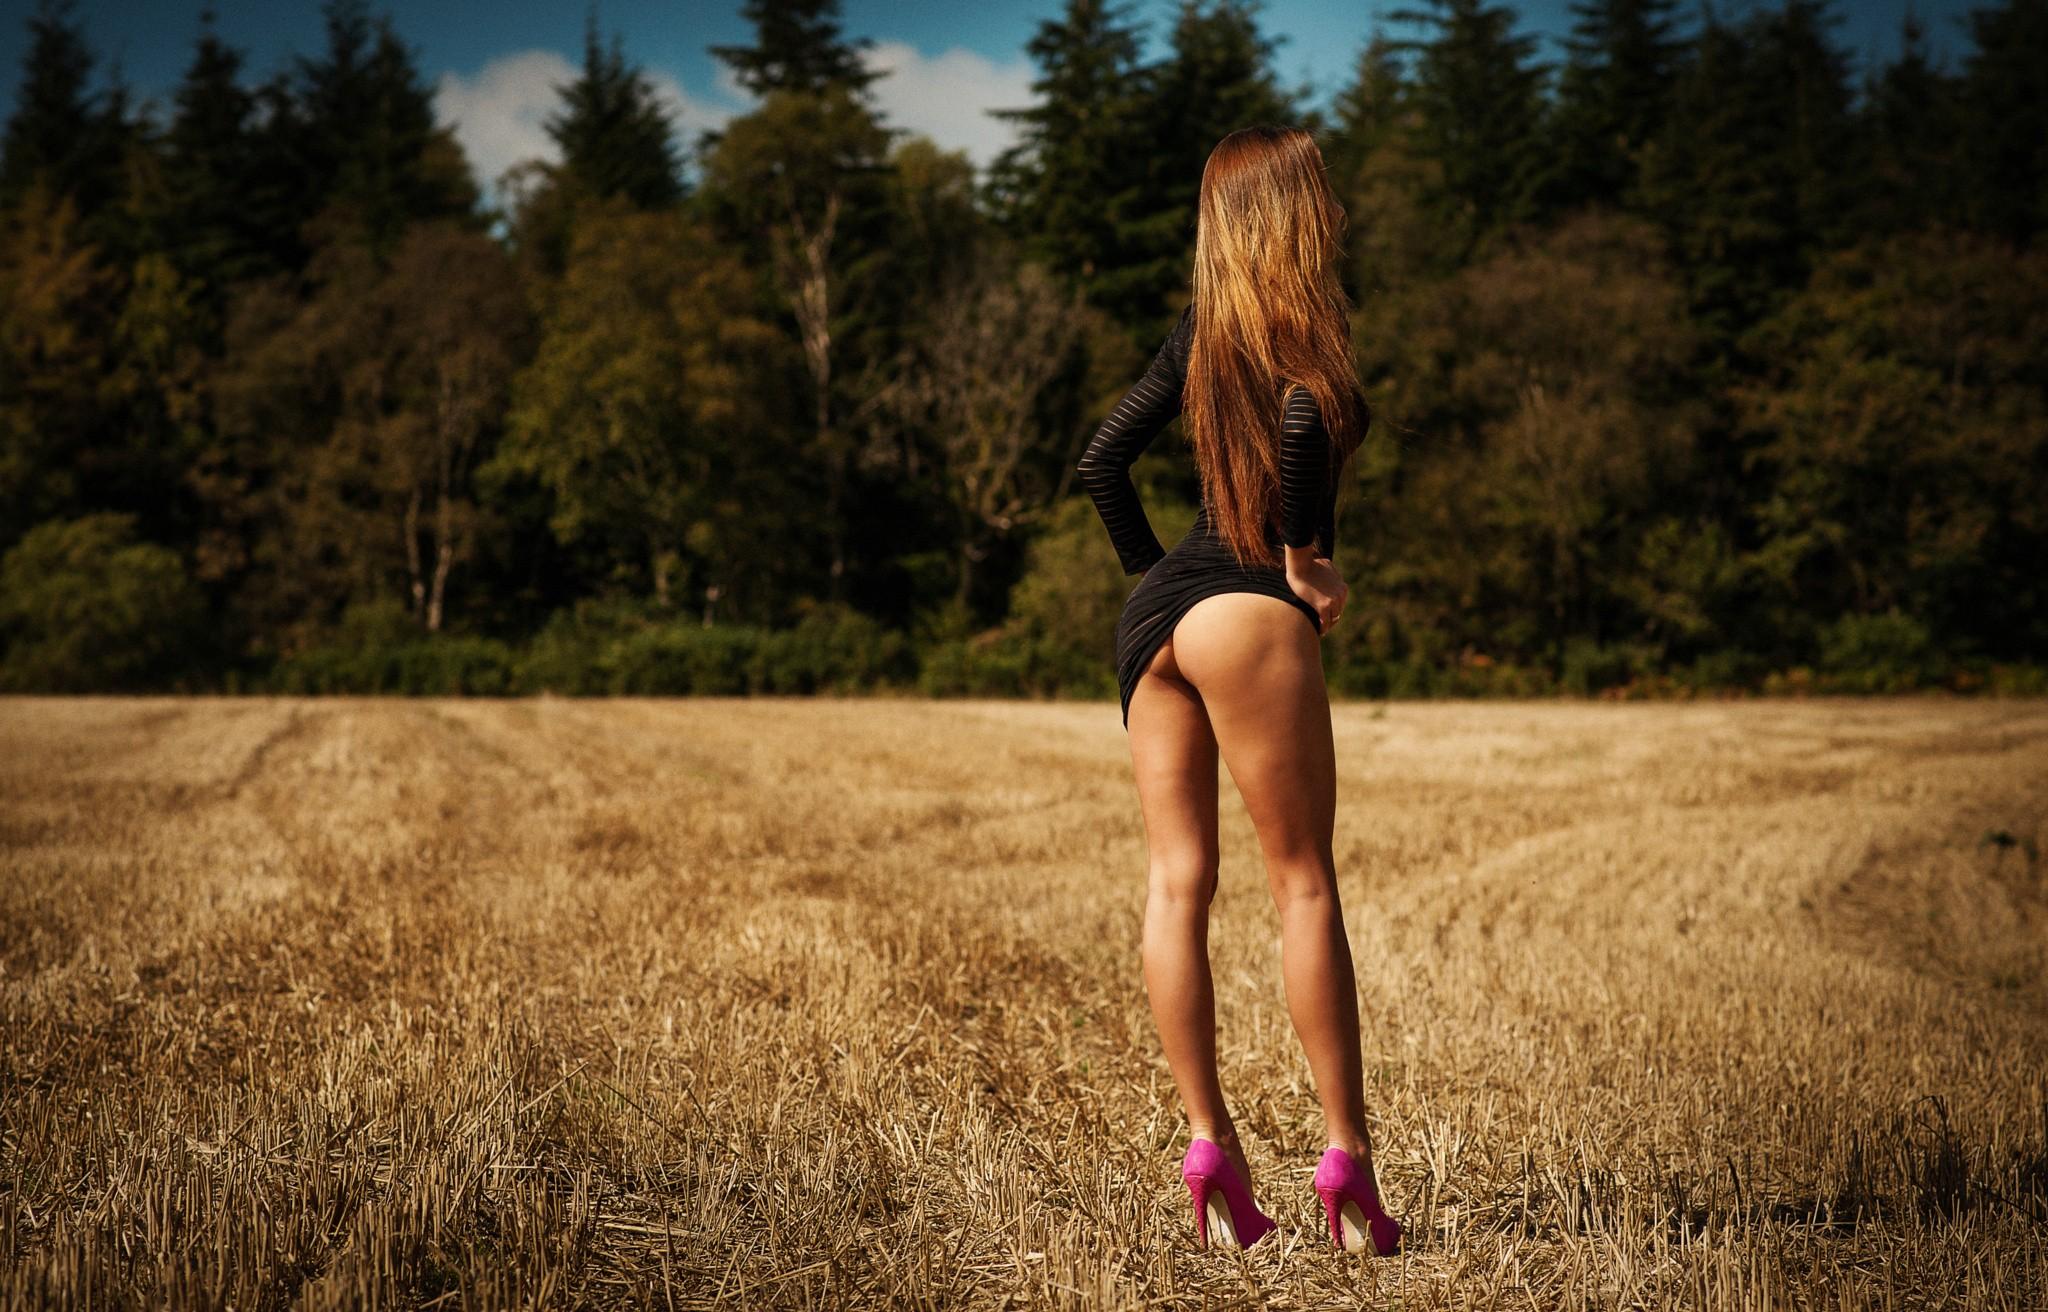 Wallpaper : sunlight, trees, women outdoors, model, long